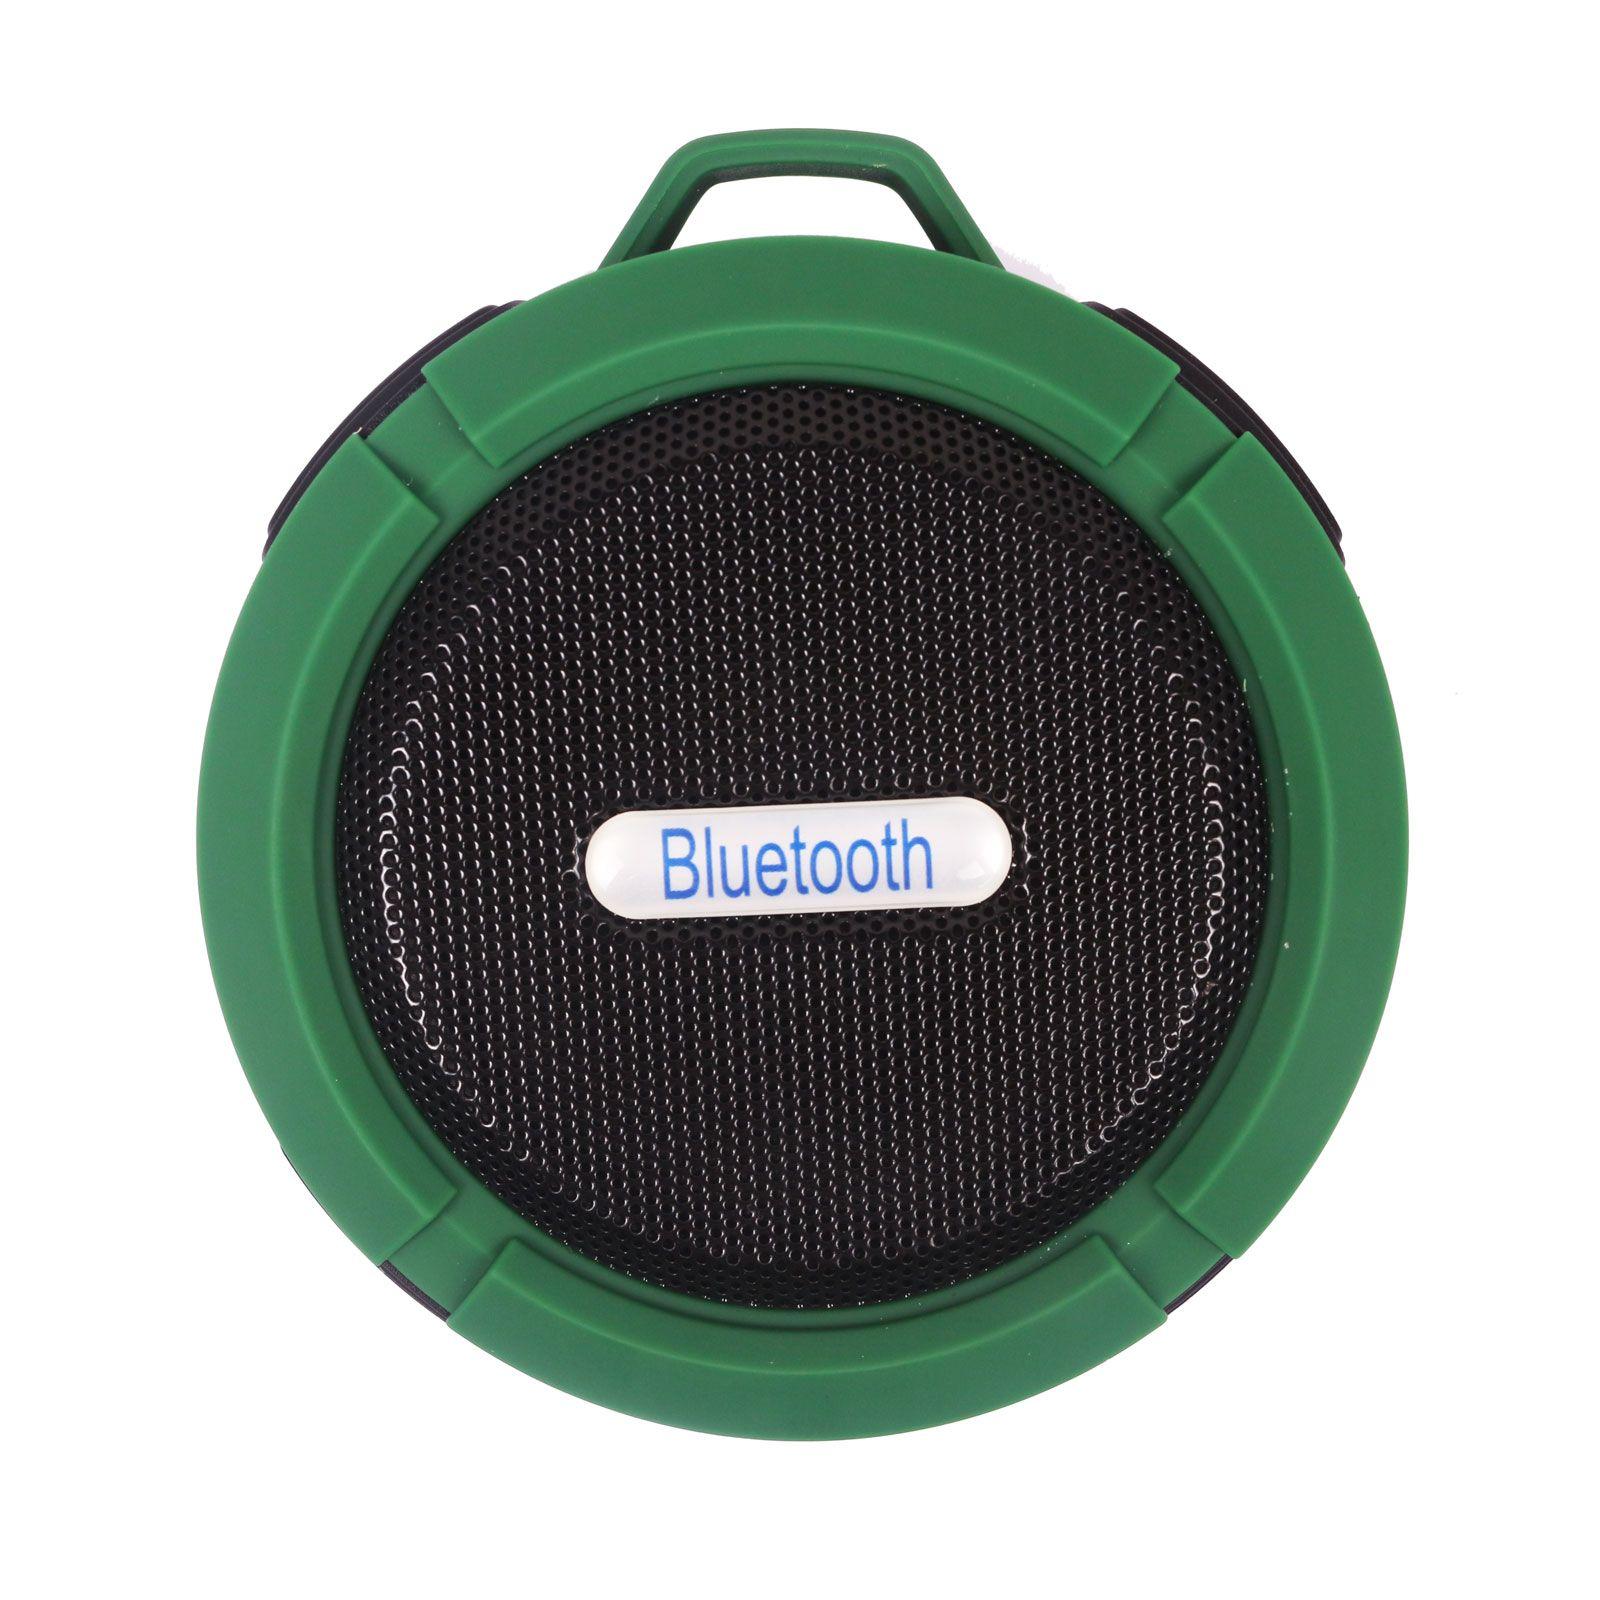 100 unids C6 Altavoz Bluetooth Ventosa Portátil Estéreo Moda Inalámbrico Impermeable Gancho para arriba Manos Libres Mini Altavoz de Audio con Micrófono